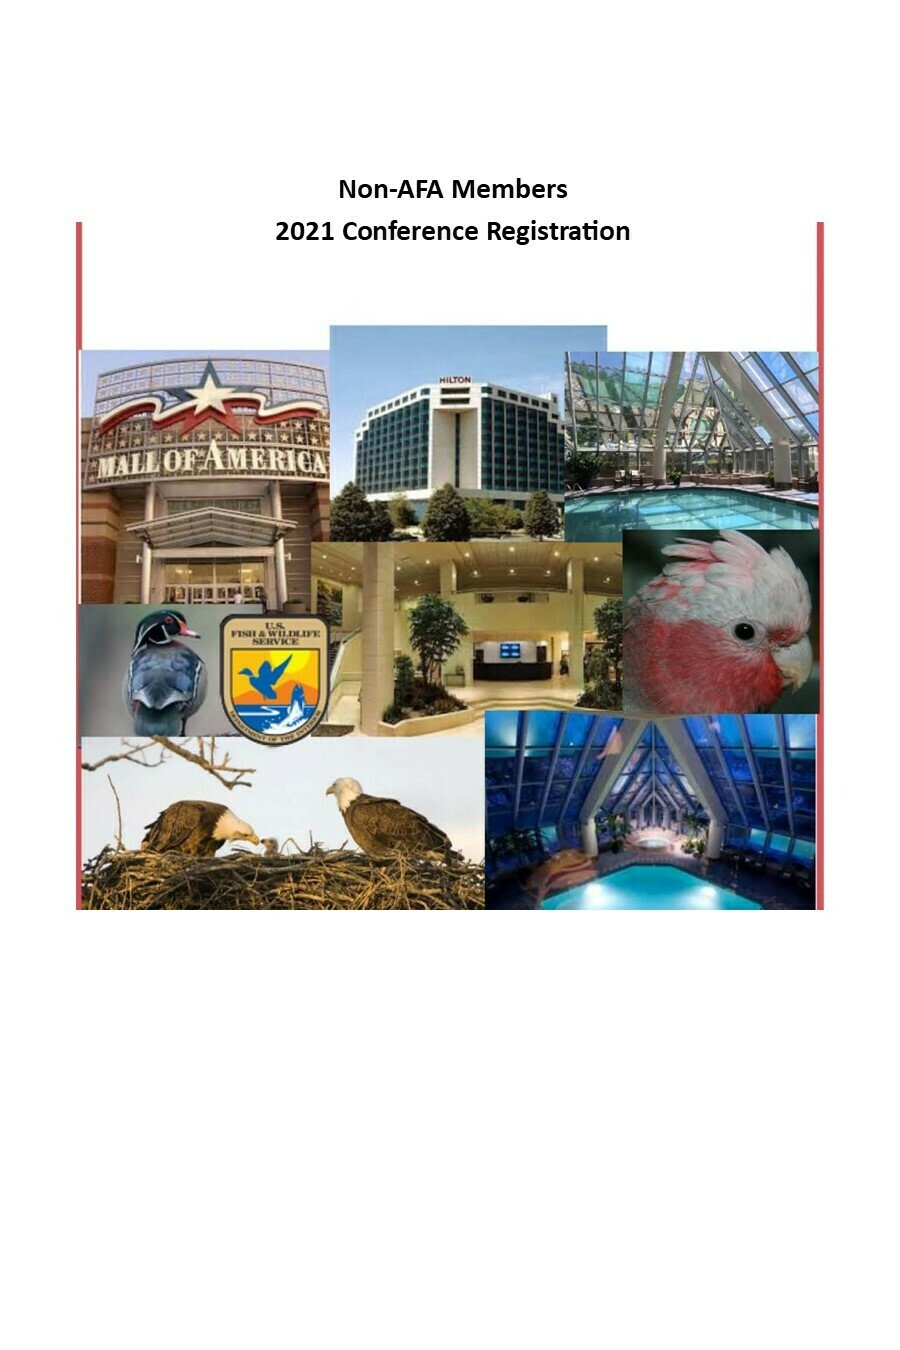 Non-AFA Members:  3 Day Full Conference Registration & Membership